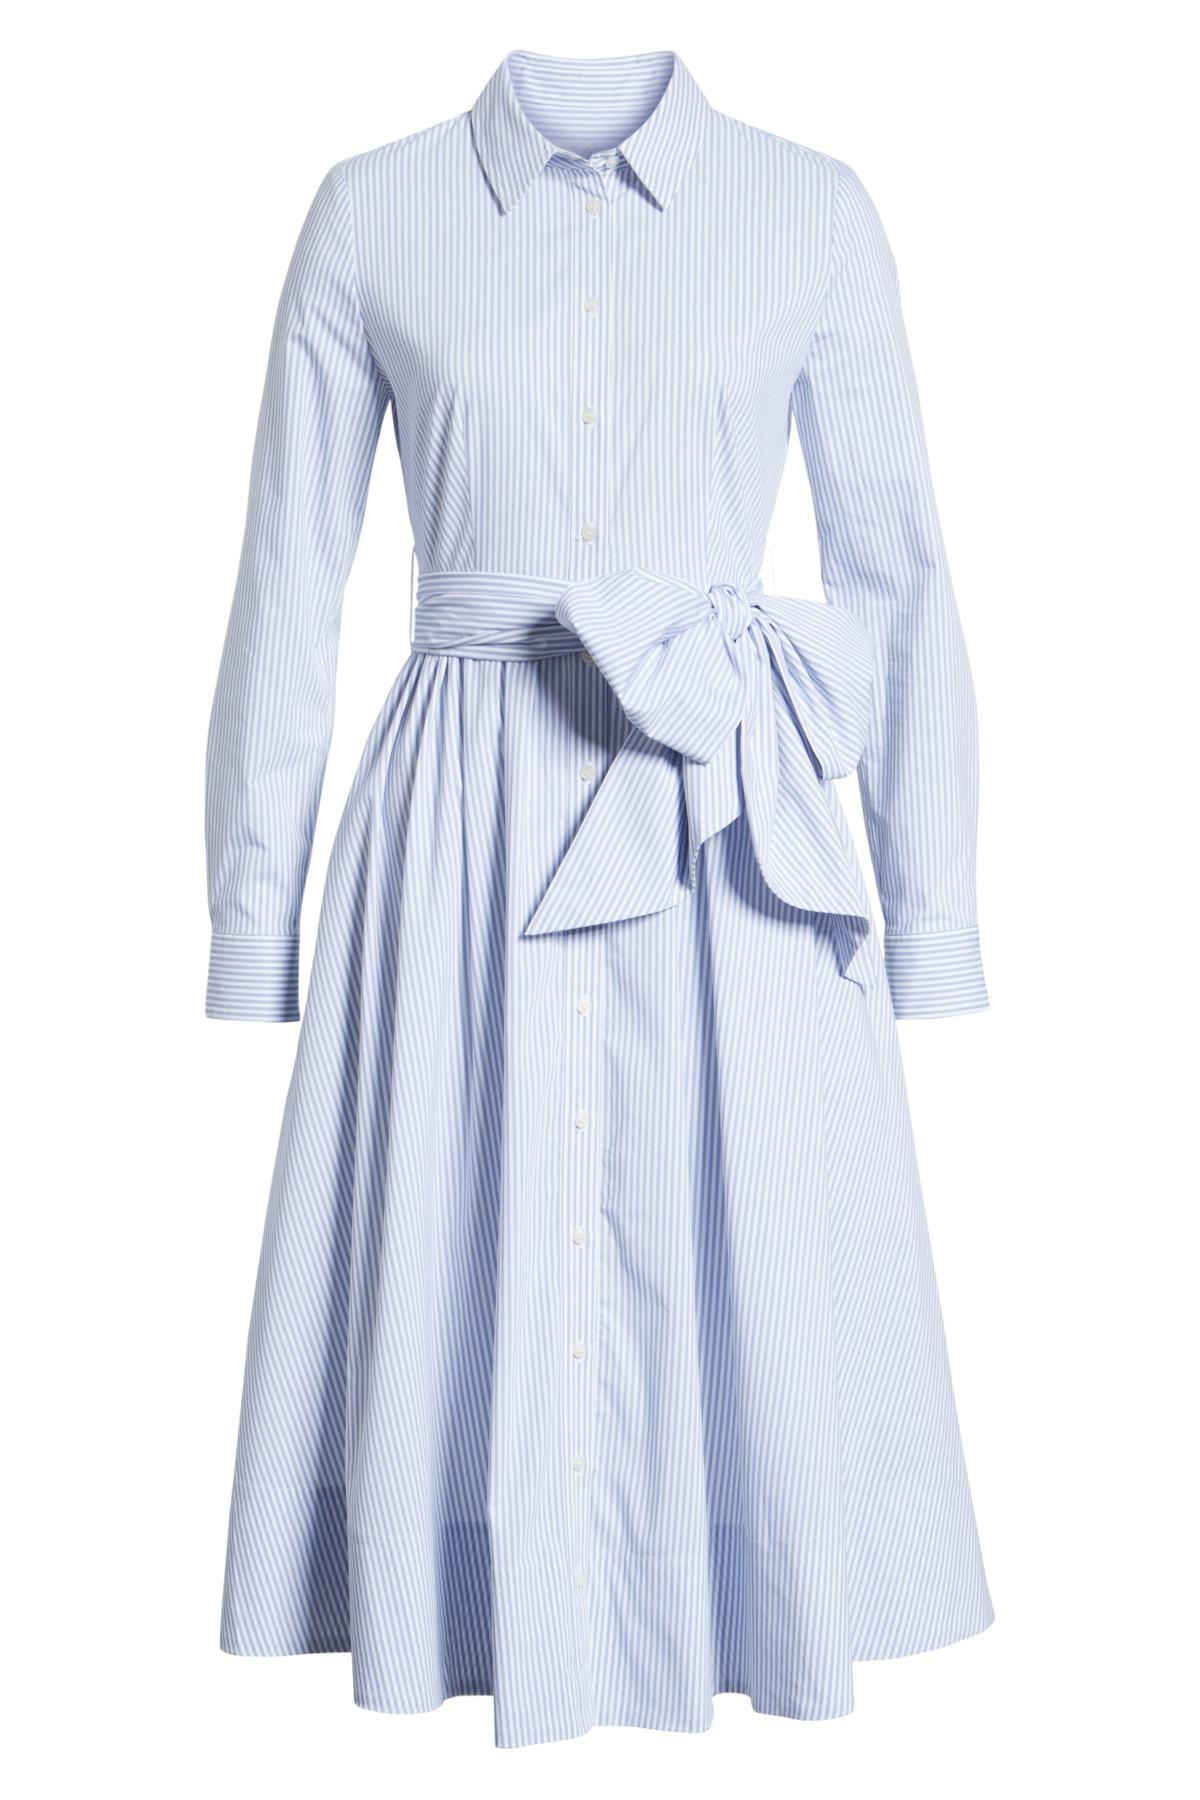 8666e81c5aa2 Lyst - 1901 Stripe Midi Shirtdress (regular & Petite) in Blue